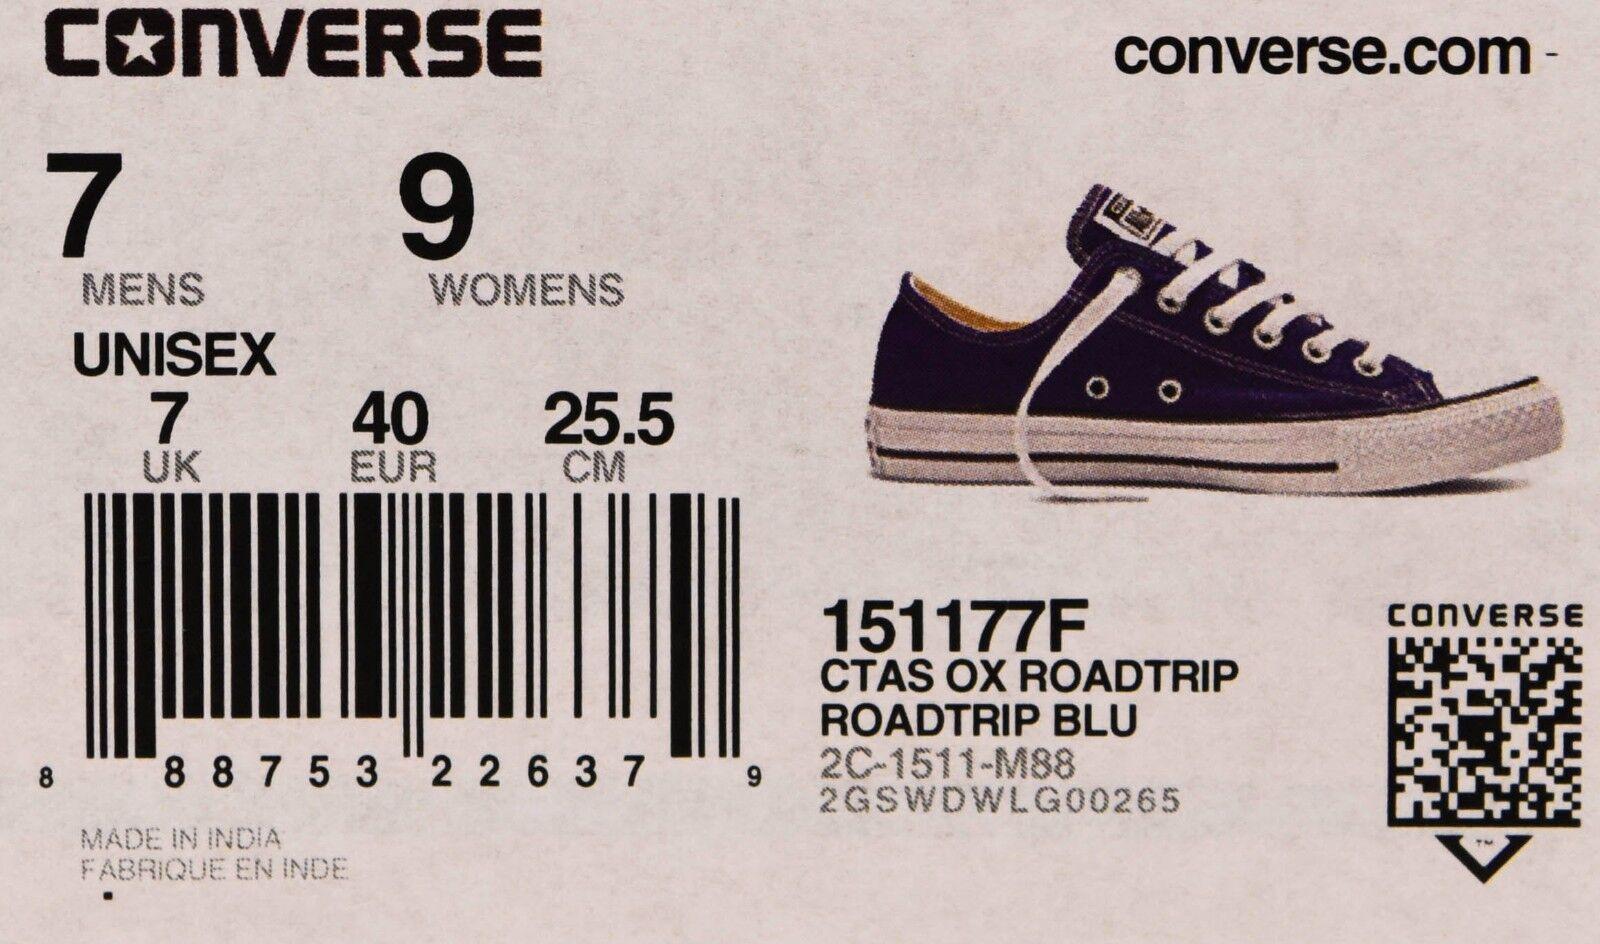 a576c2b7b25ab9 Converse Men Chuck Taylor All Star Ox Low Roadtrip Blue White Trainers  151177f 7